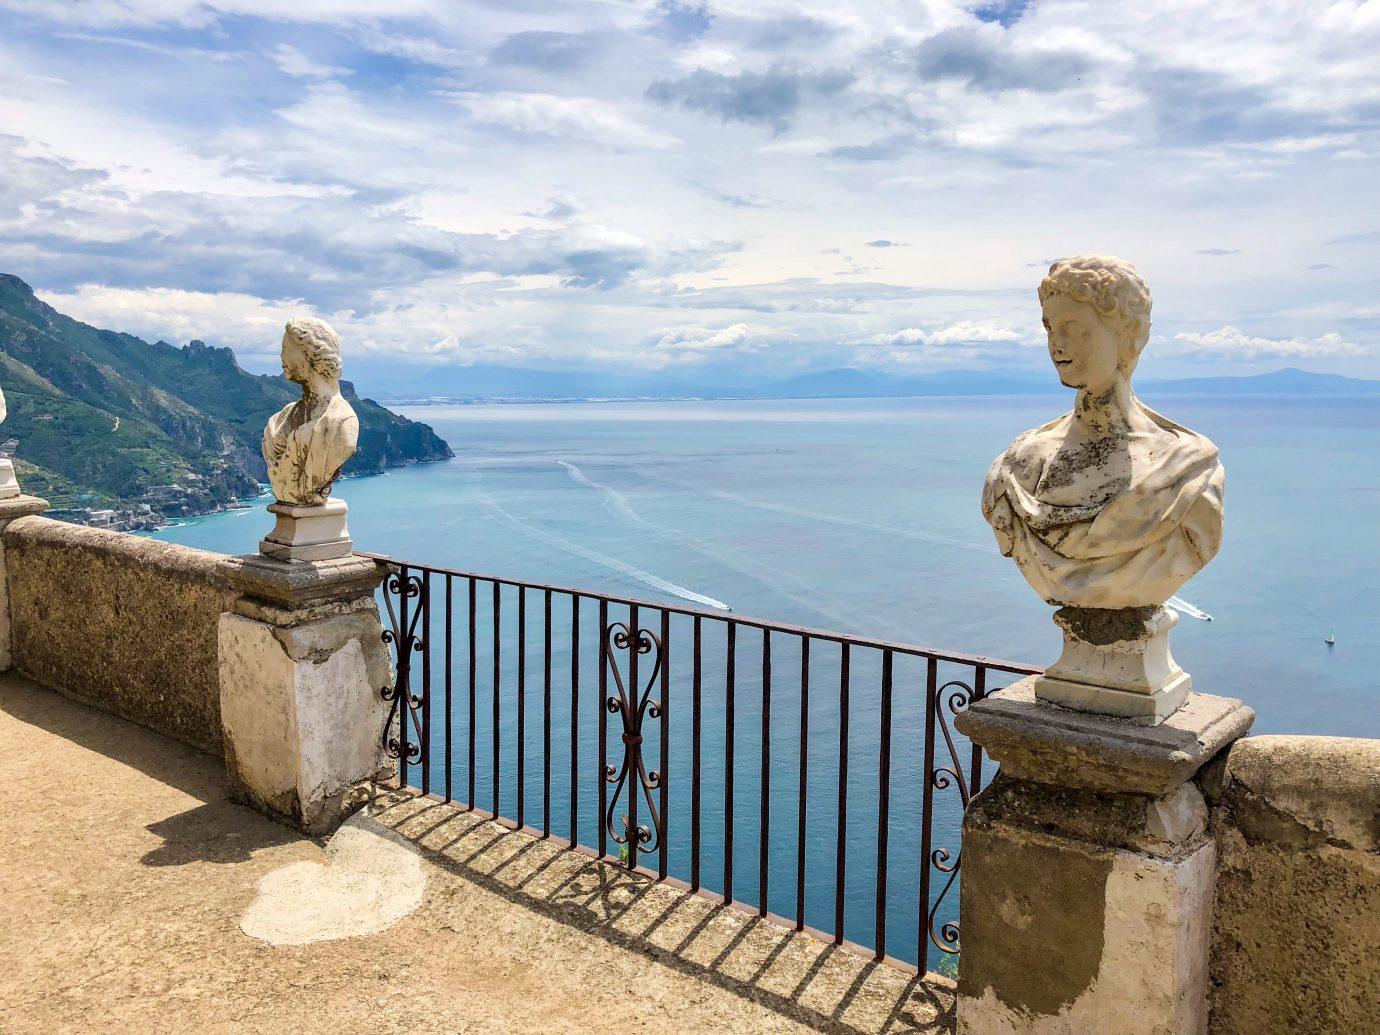 Balcony with view over the Amalfi Coast